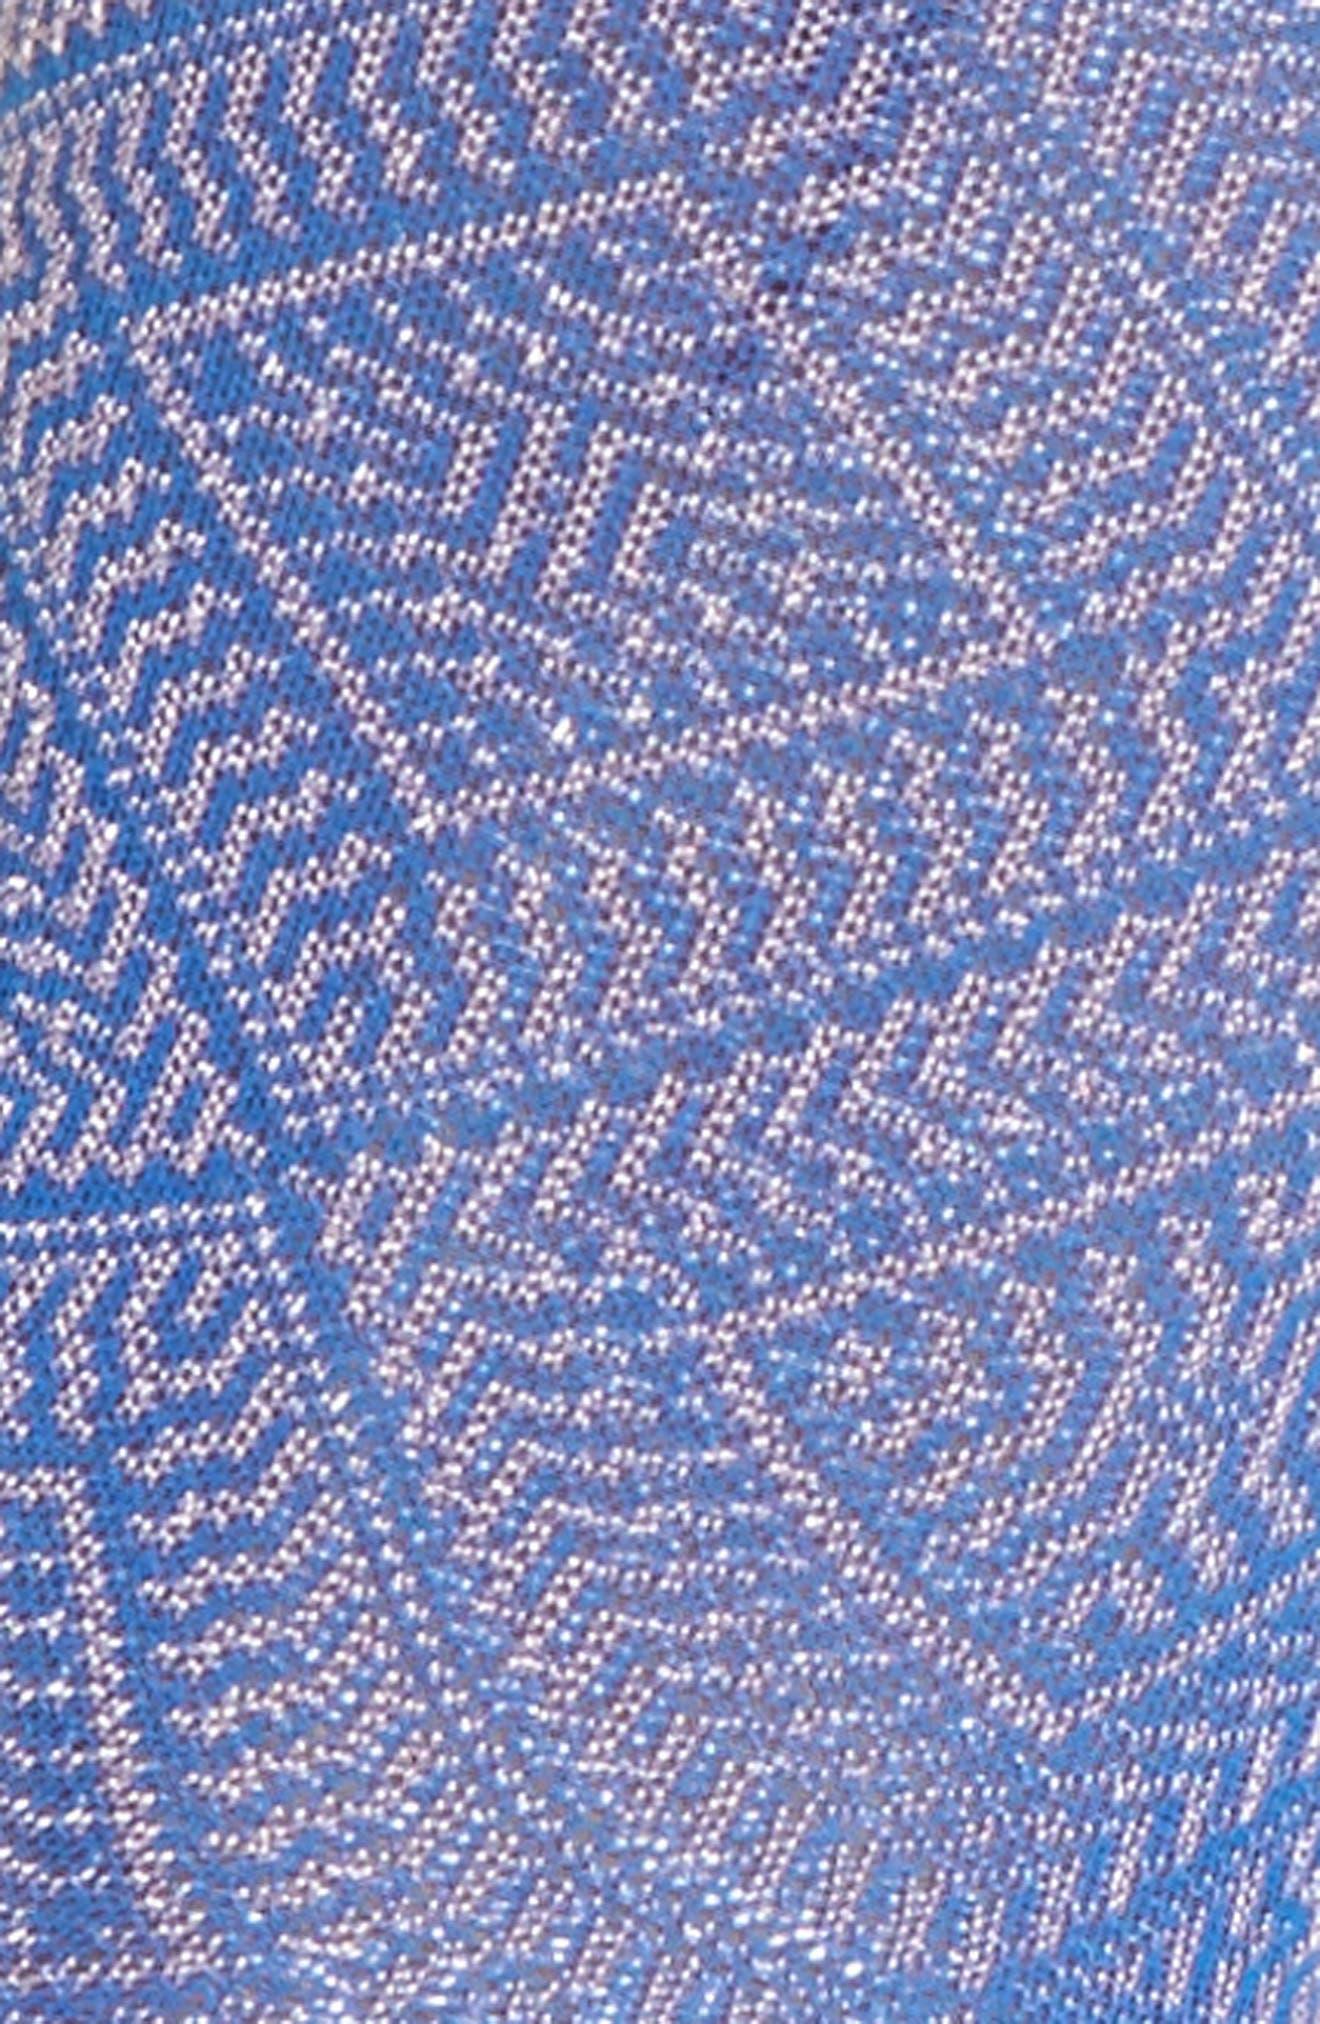 Jill Ankle Socks,                             Alternate thumbnail 2, color,                             Blue